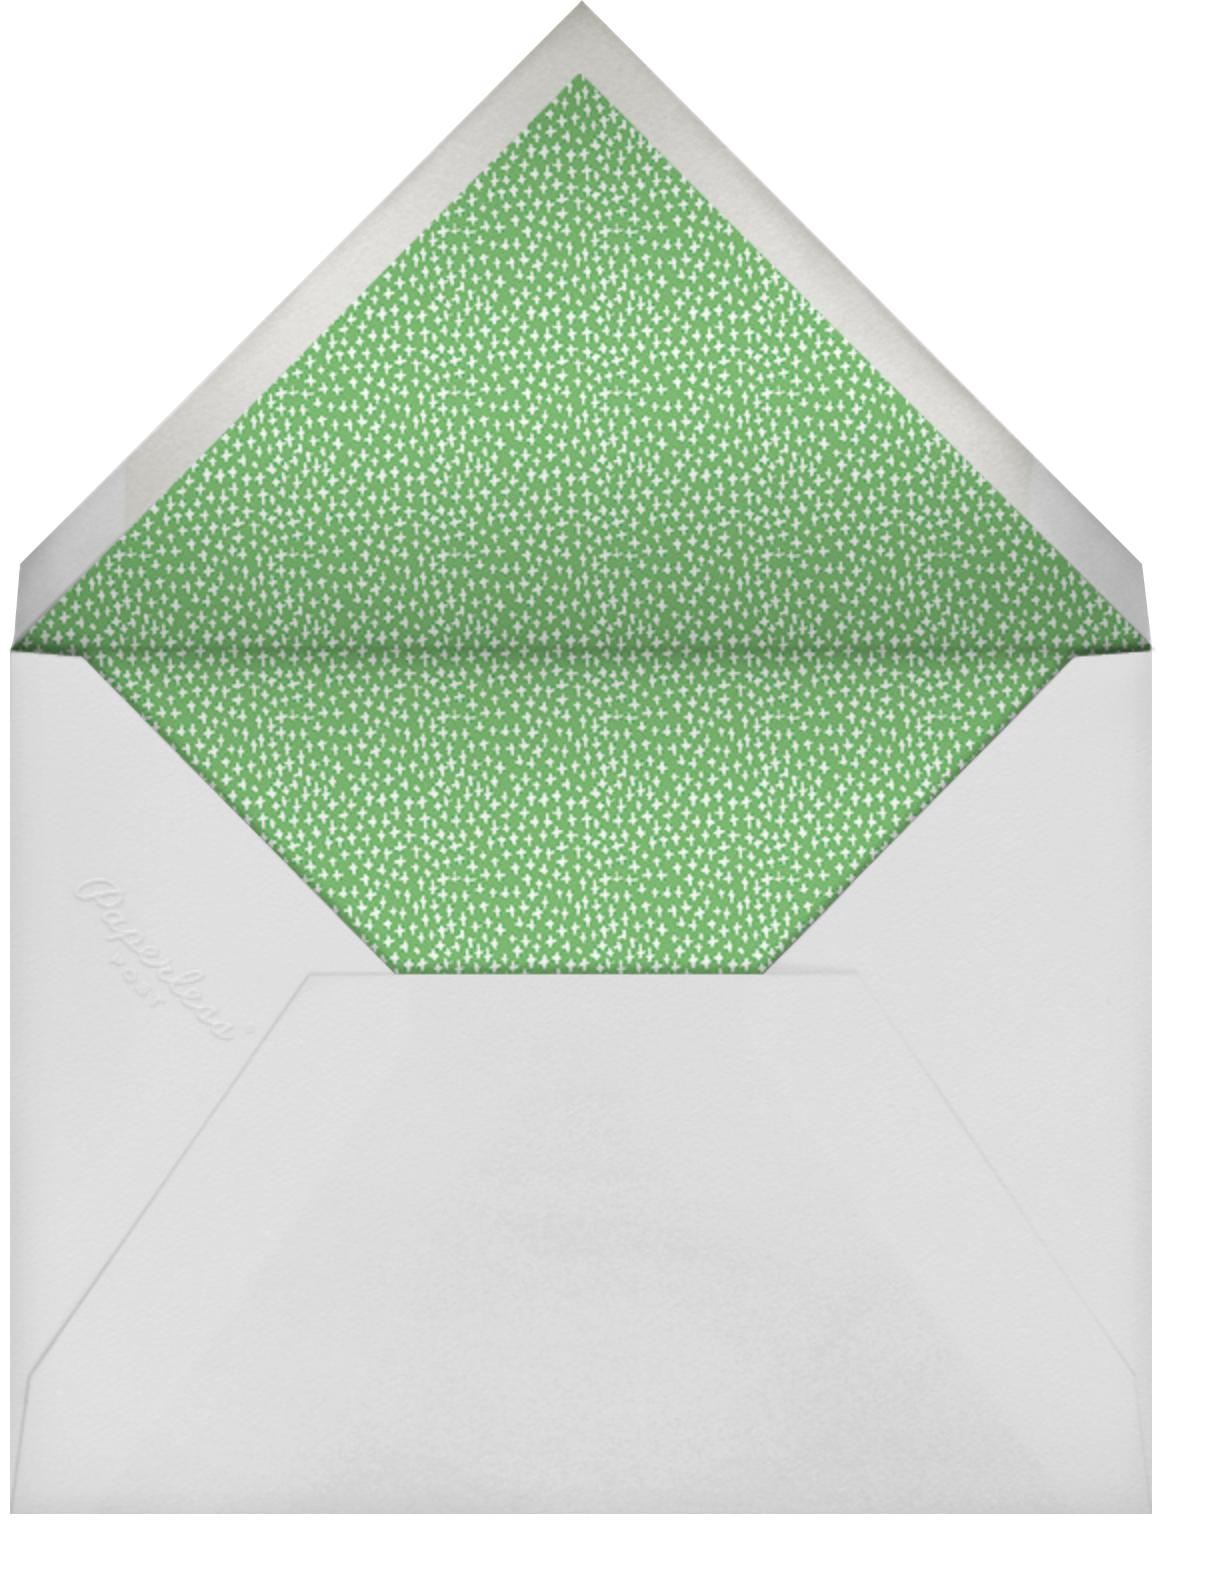 Among the Daisies - Lavender - Mr. Boddington's Studio - Envelope